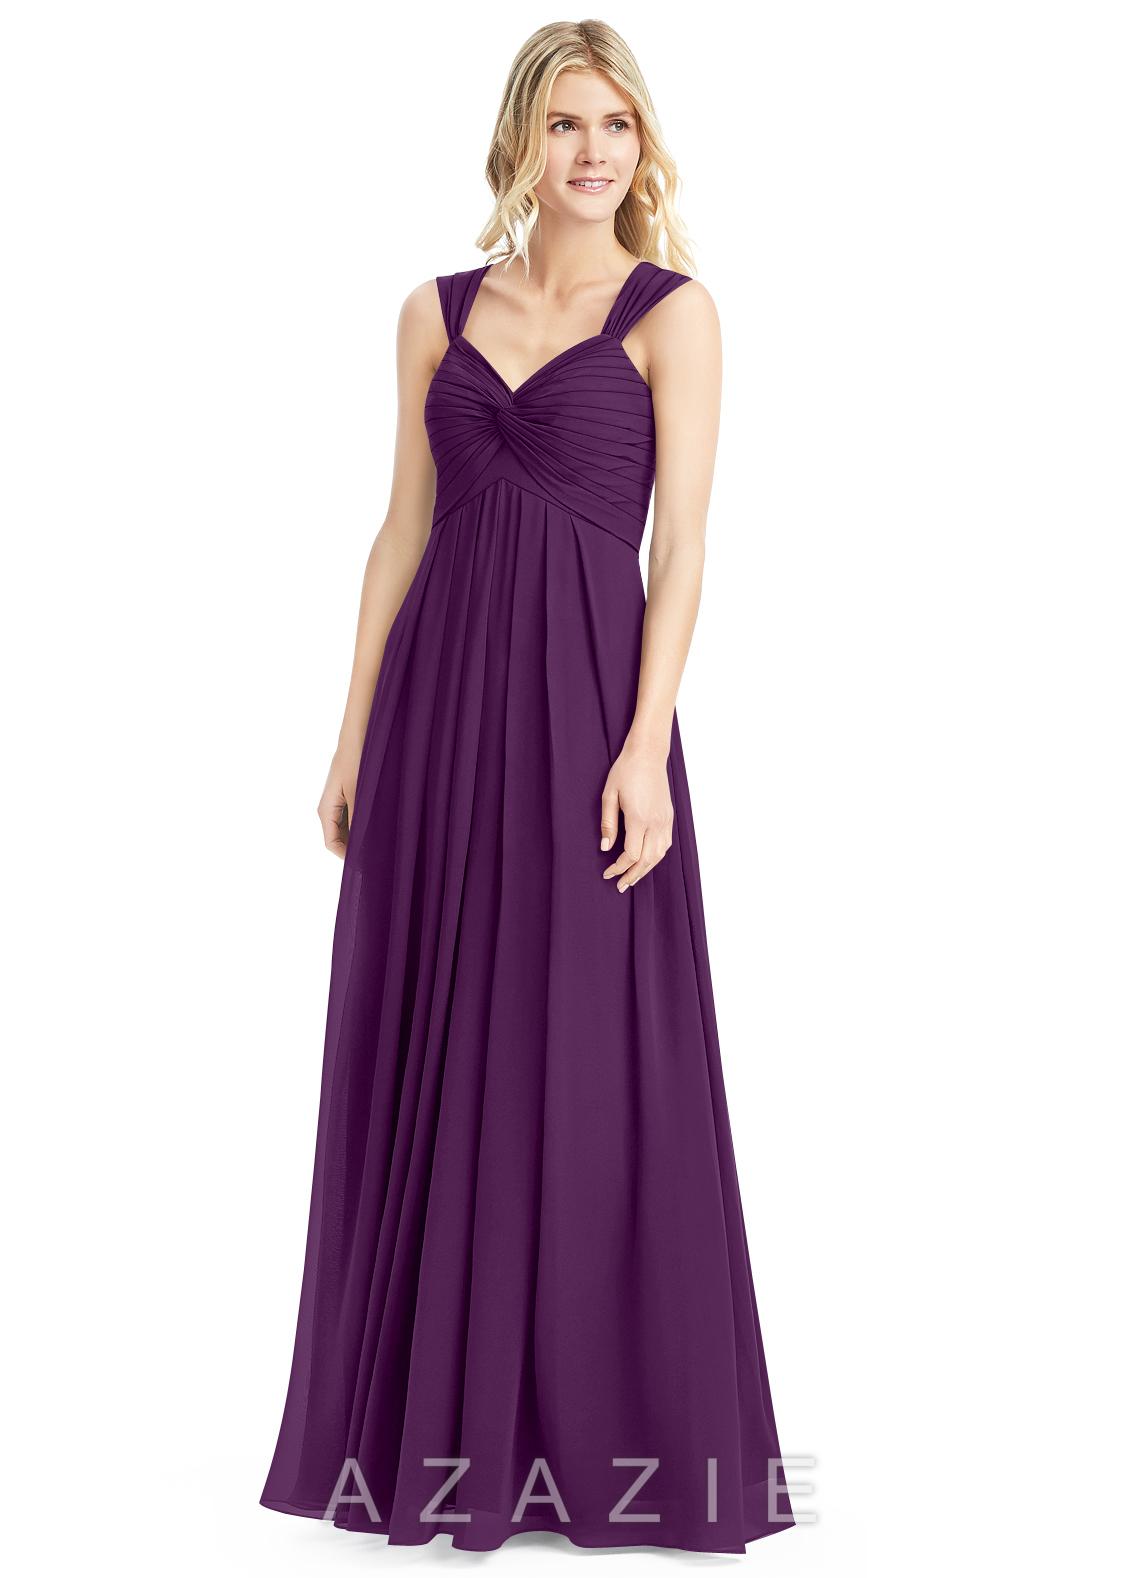 Grape Bridesmaid Dresses Under 50 Dollars USA